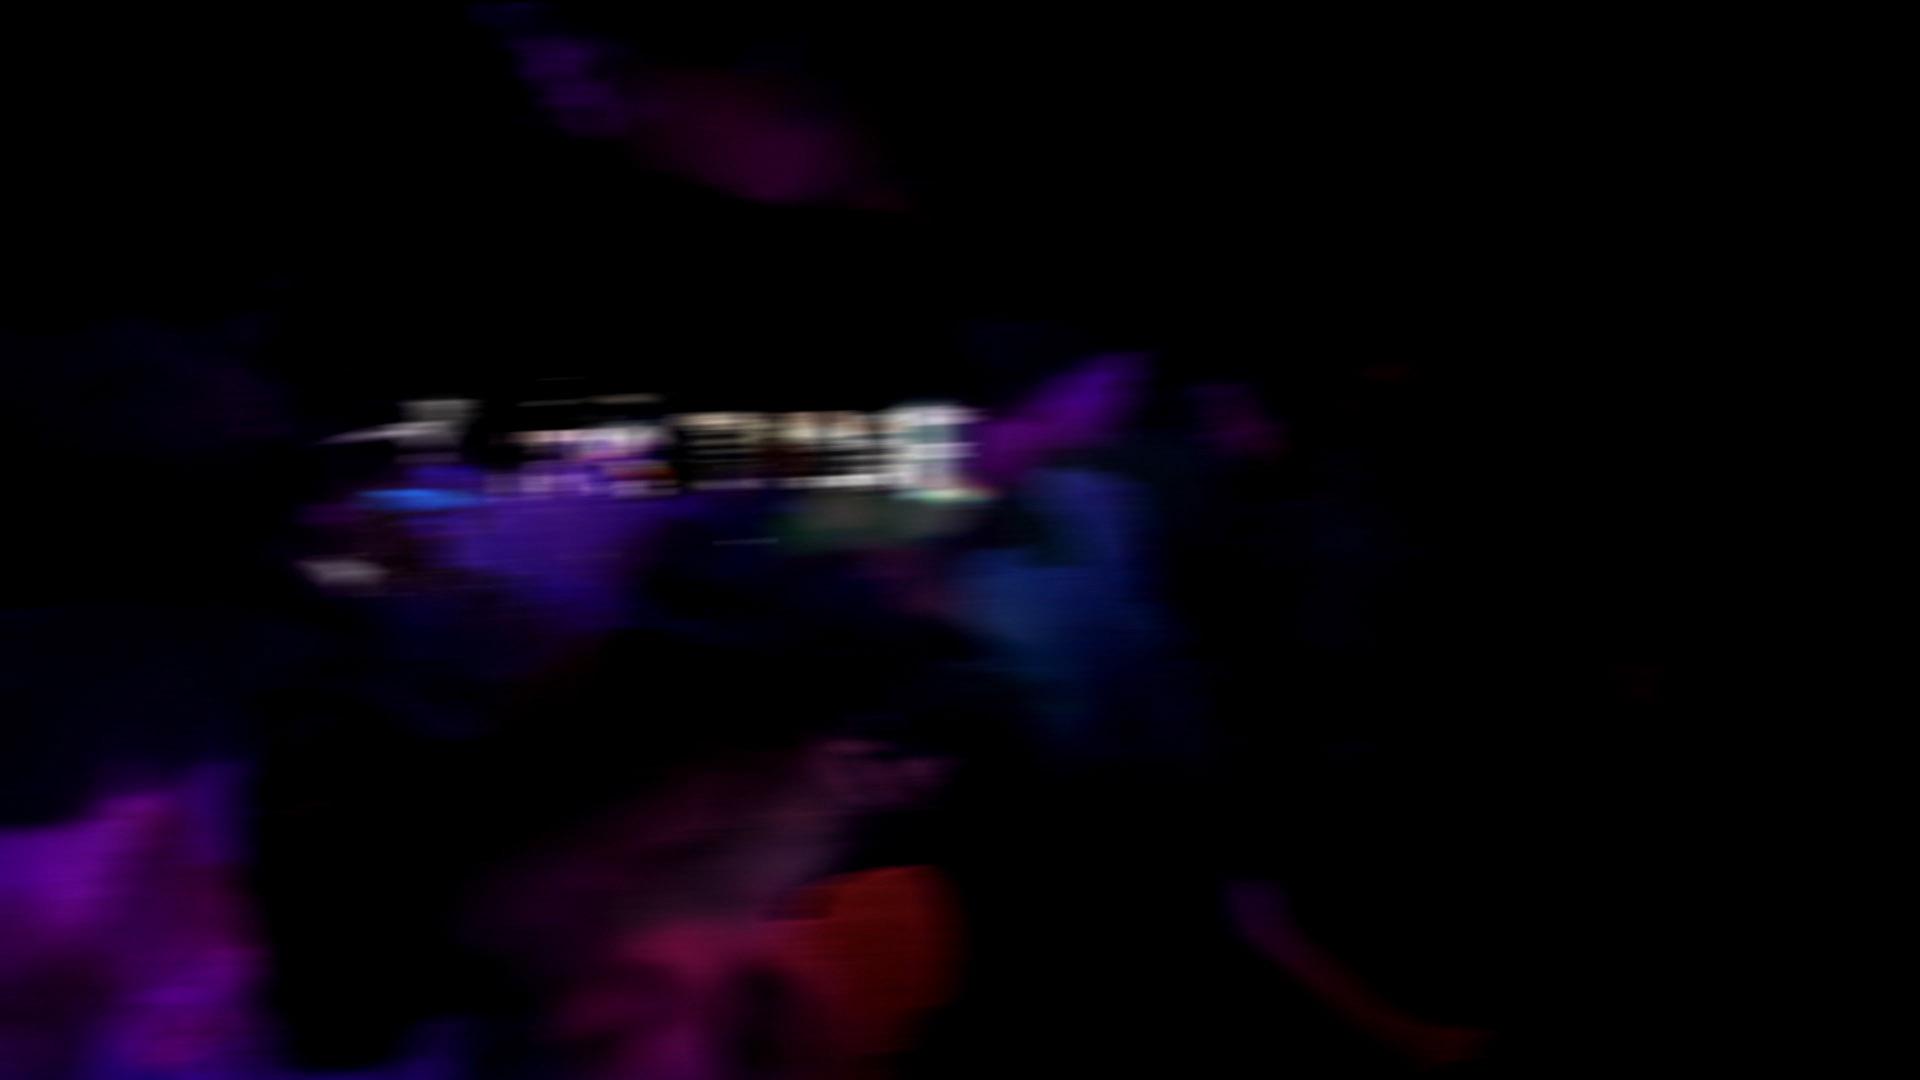 AKA_Teaser_Dreams_Texted_PreLaunch_Stereo_ProResHQ (00867)_web.jpg